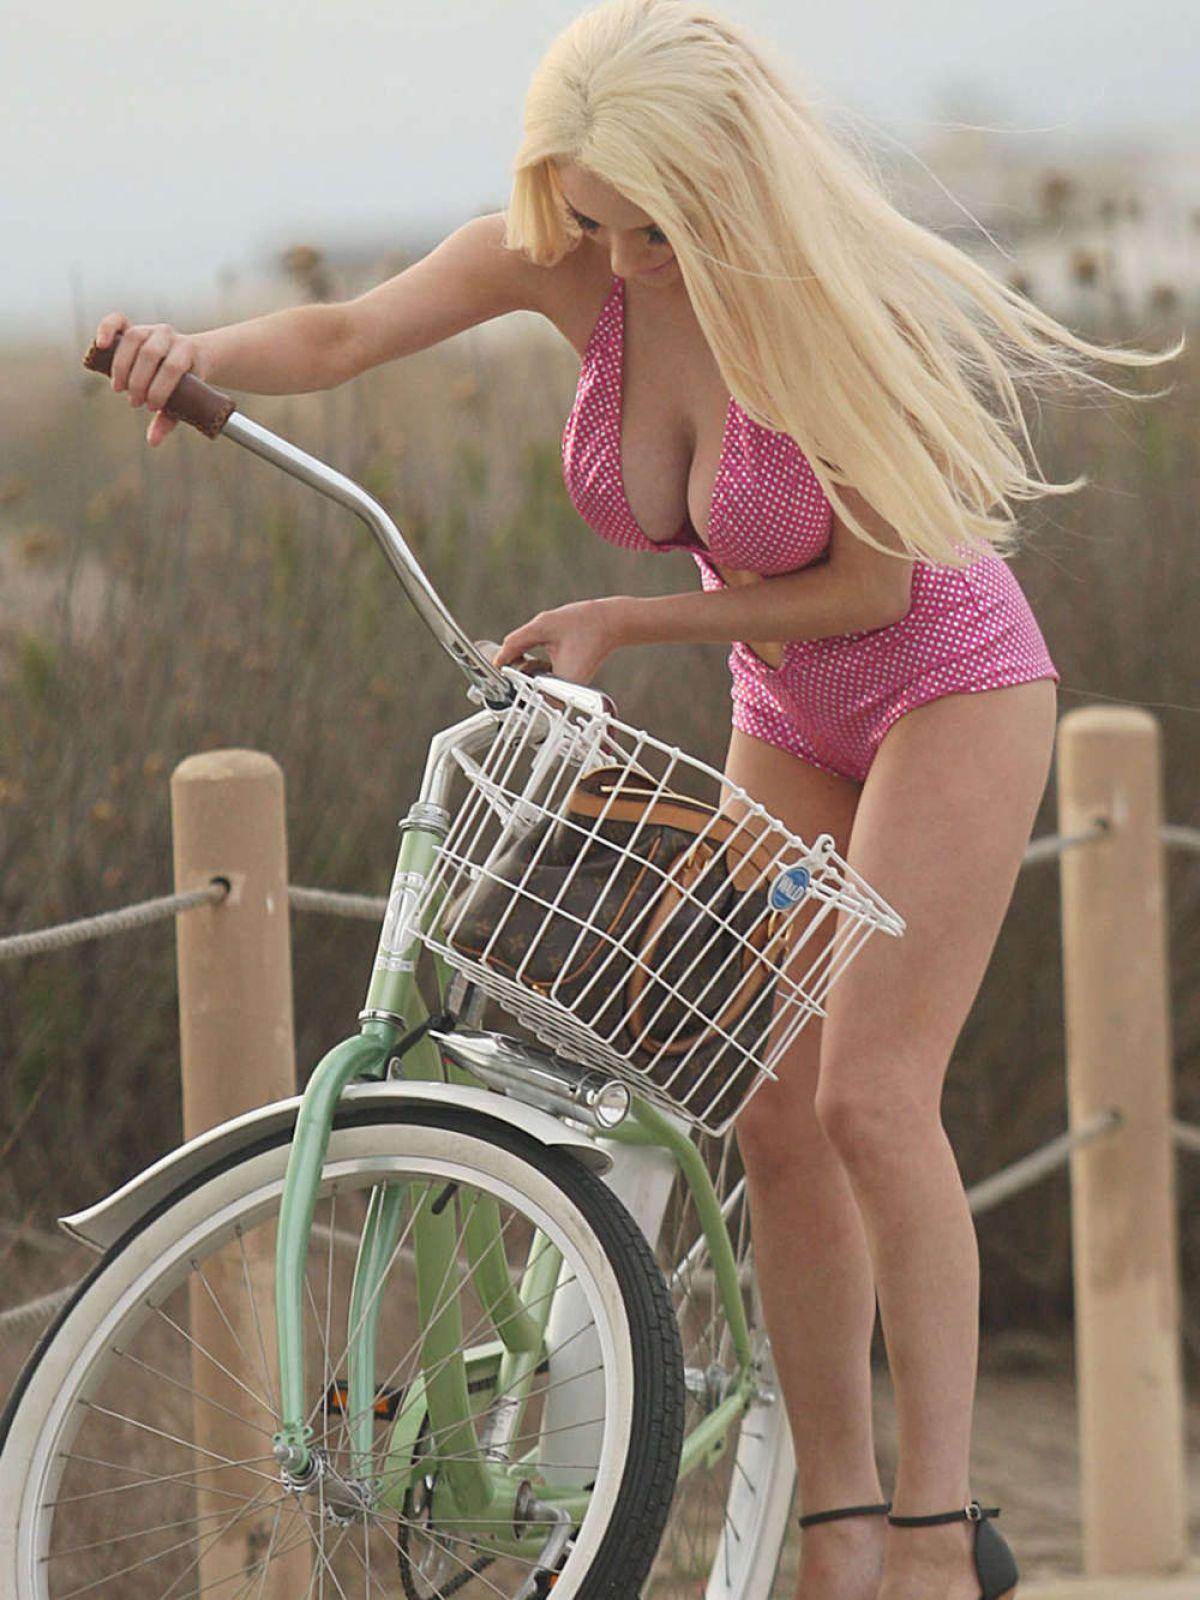 ourtney-stodden-falls-off-her-bike-in-los-angeles_6.jpg